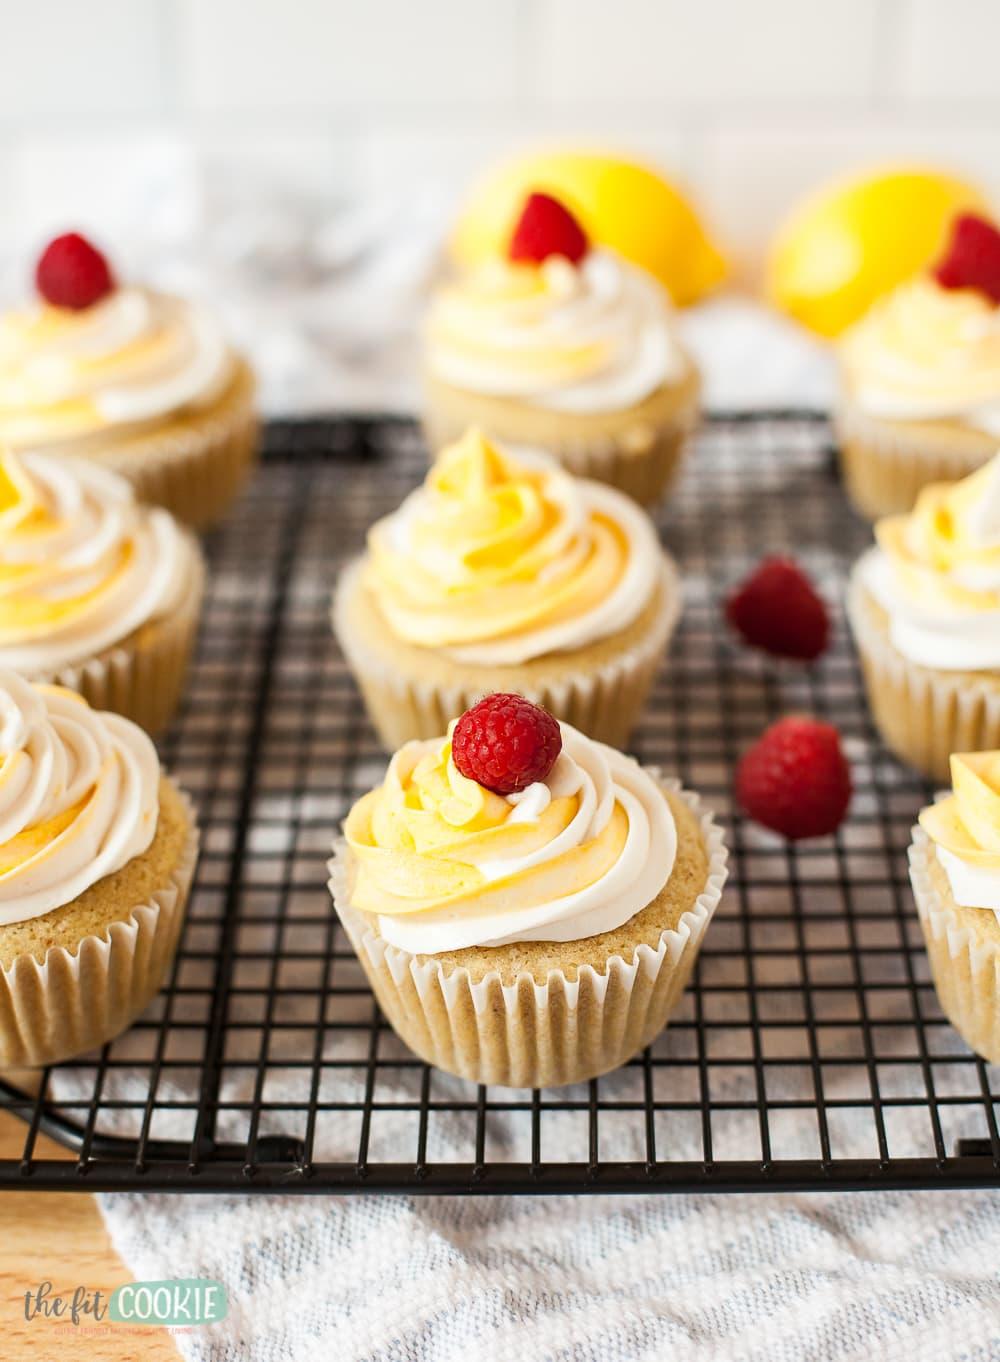 gluten free lemon cupcakes with raspberry on top